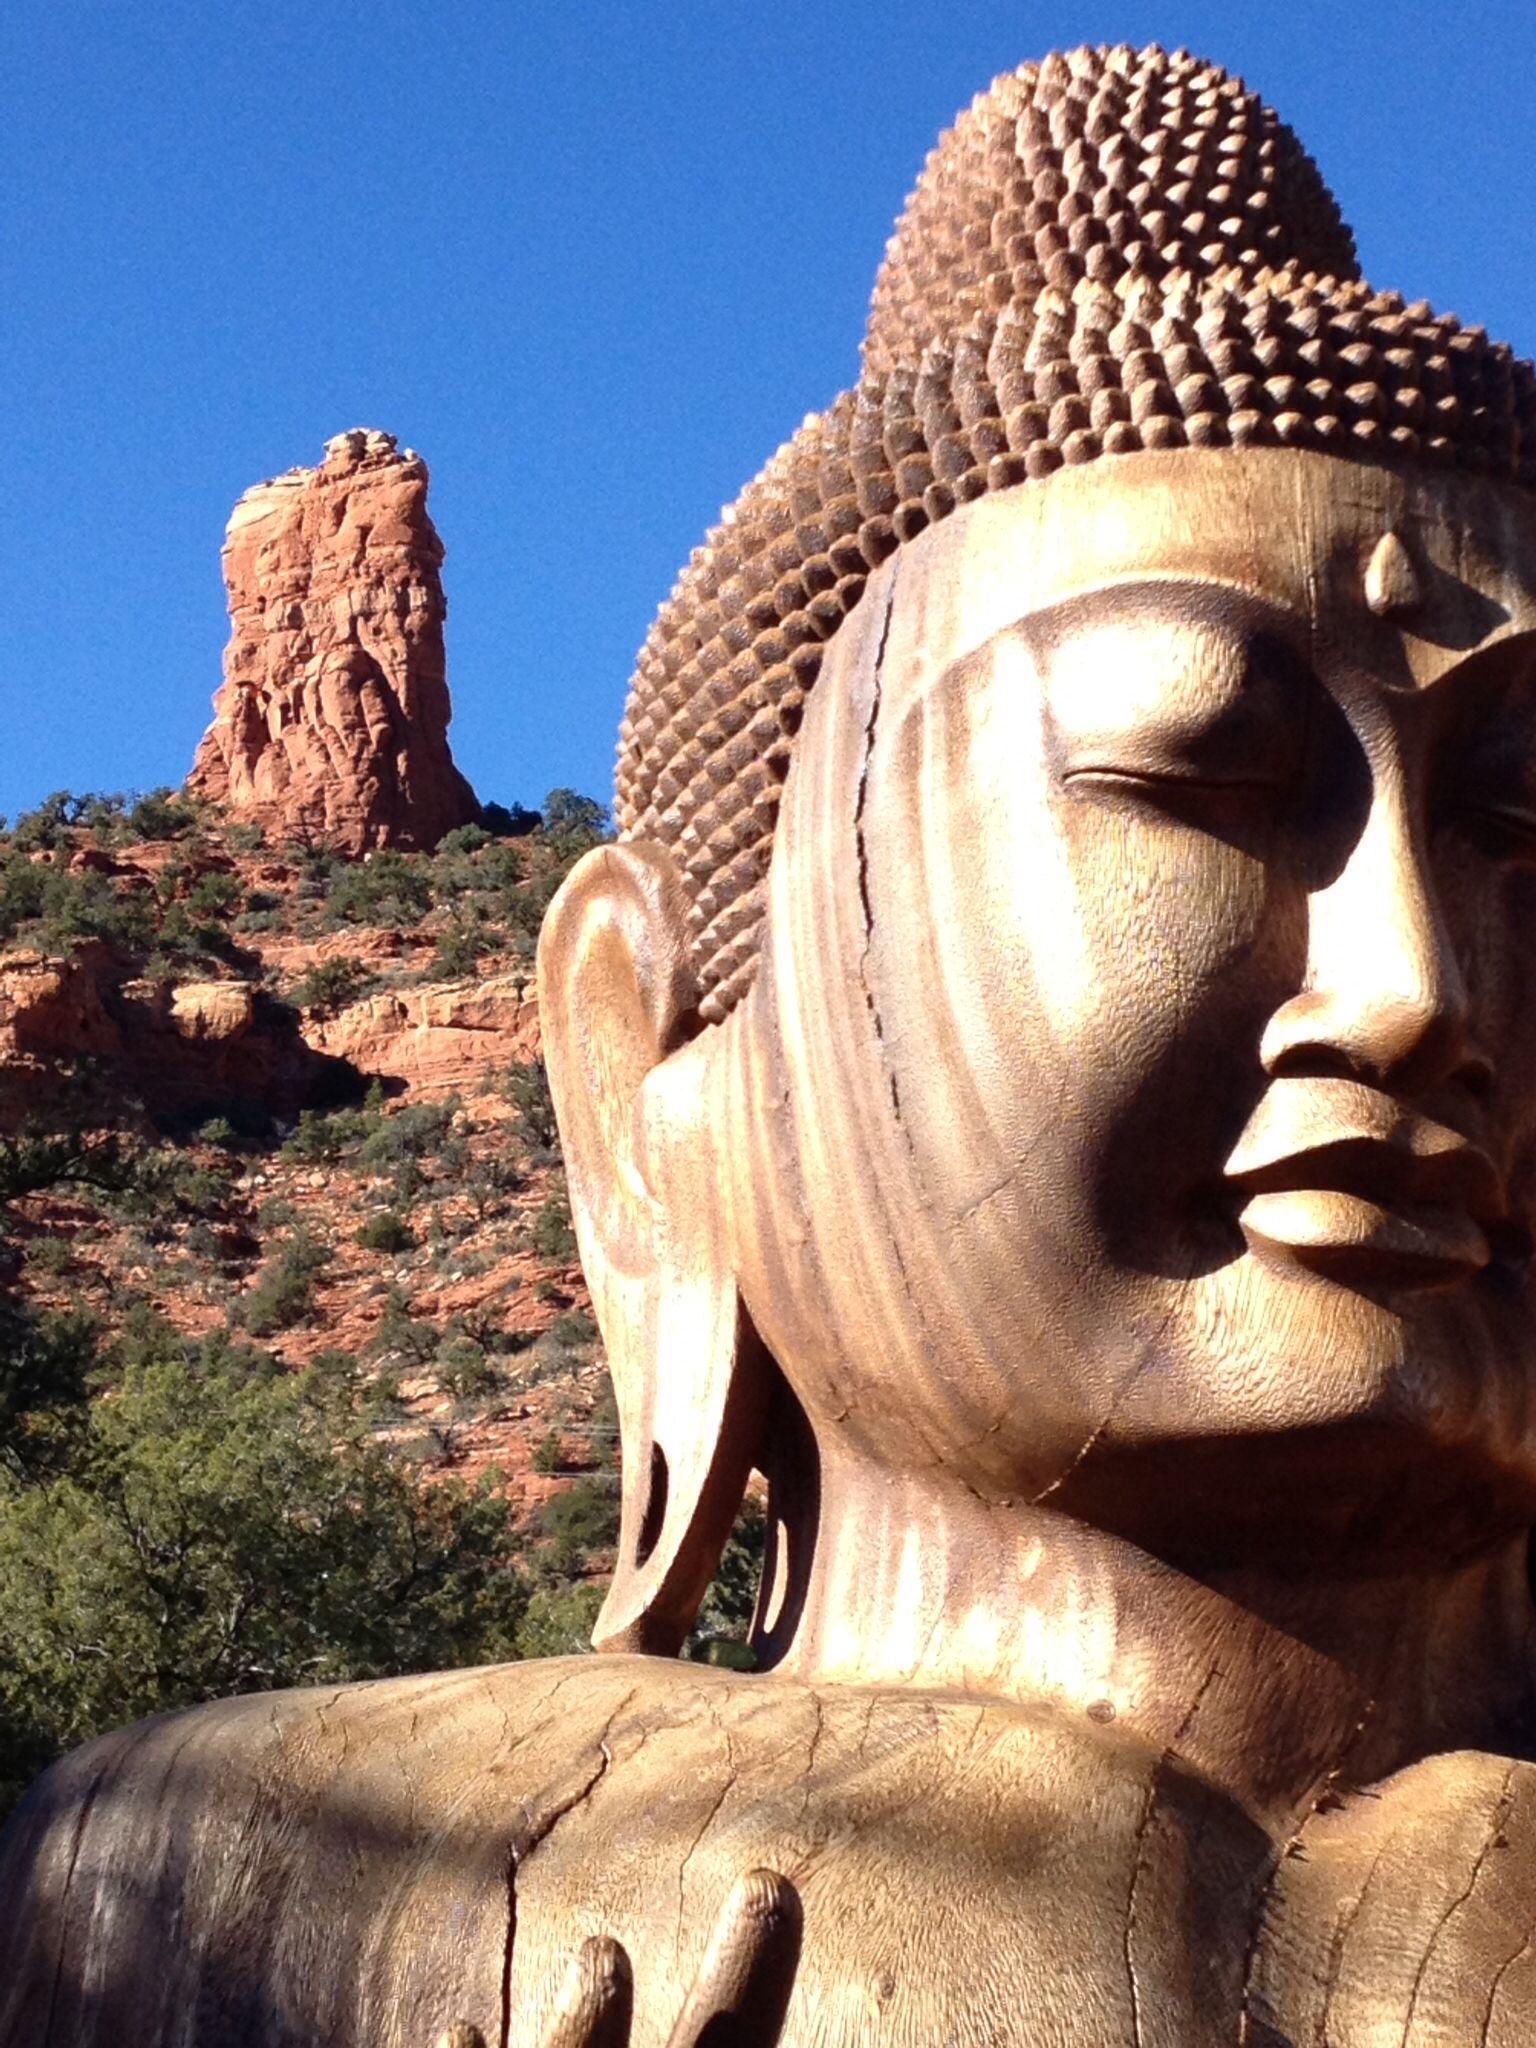 Red Rock Buddha at Buddha Beach - Sedona, Arizona | Buddha ...